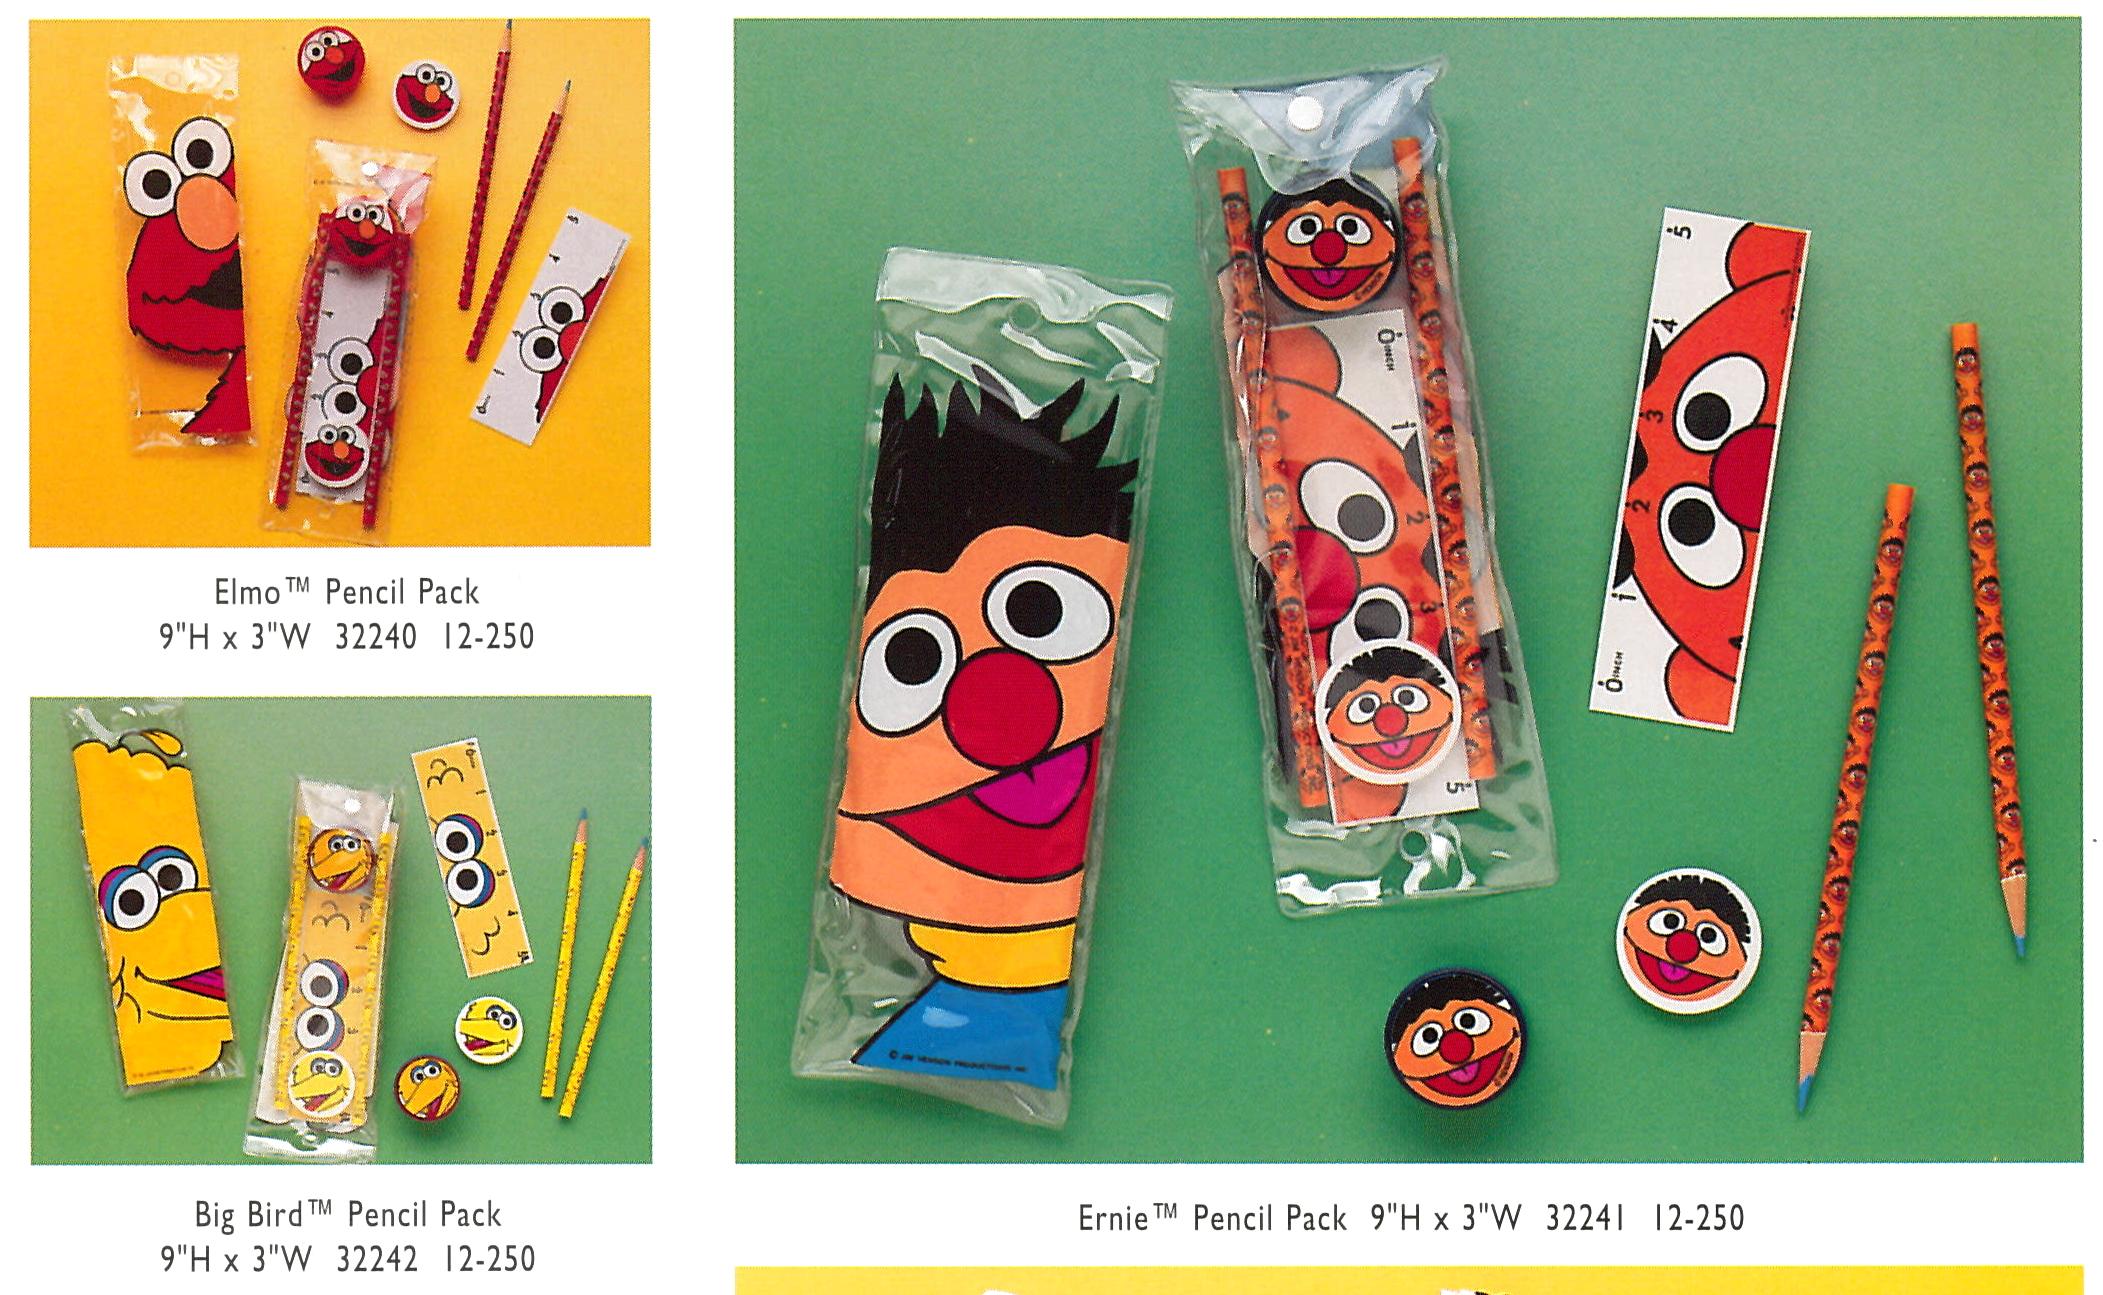 Sesame Street pencil packs